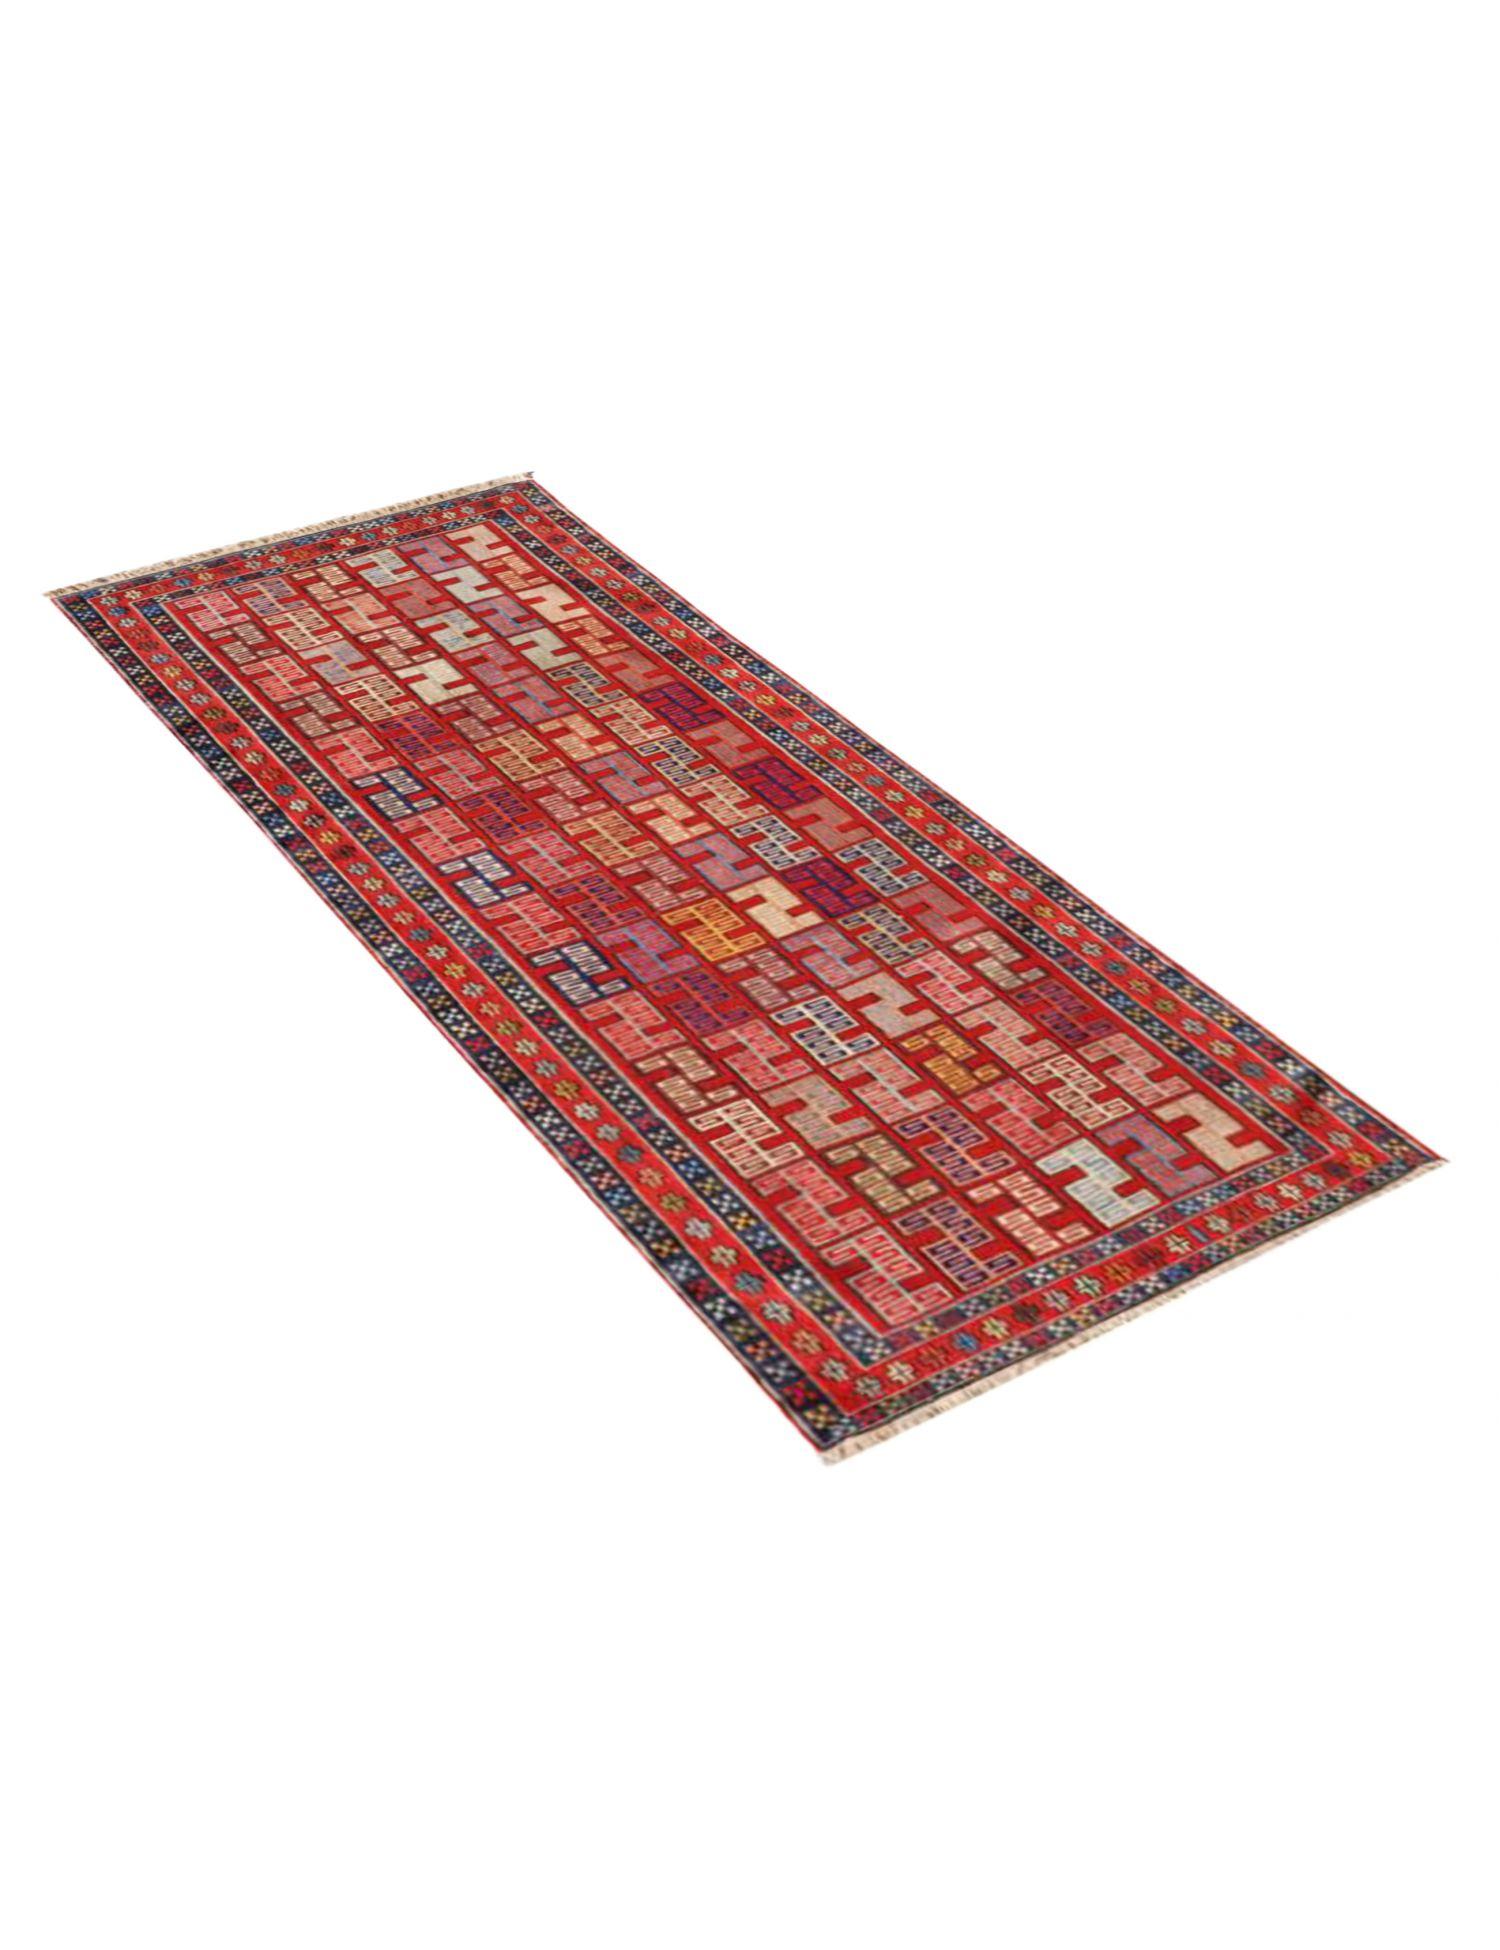 PERSIAN WOOL KILIMS    <br/>202 x 84 cm